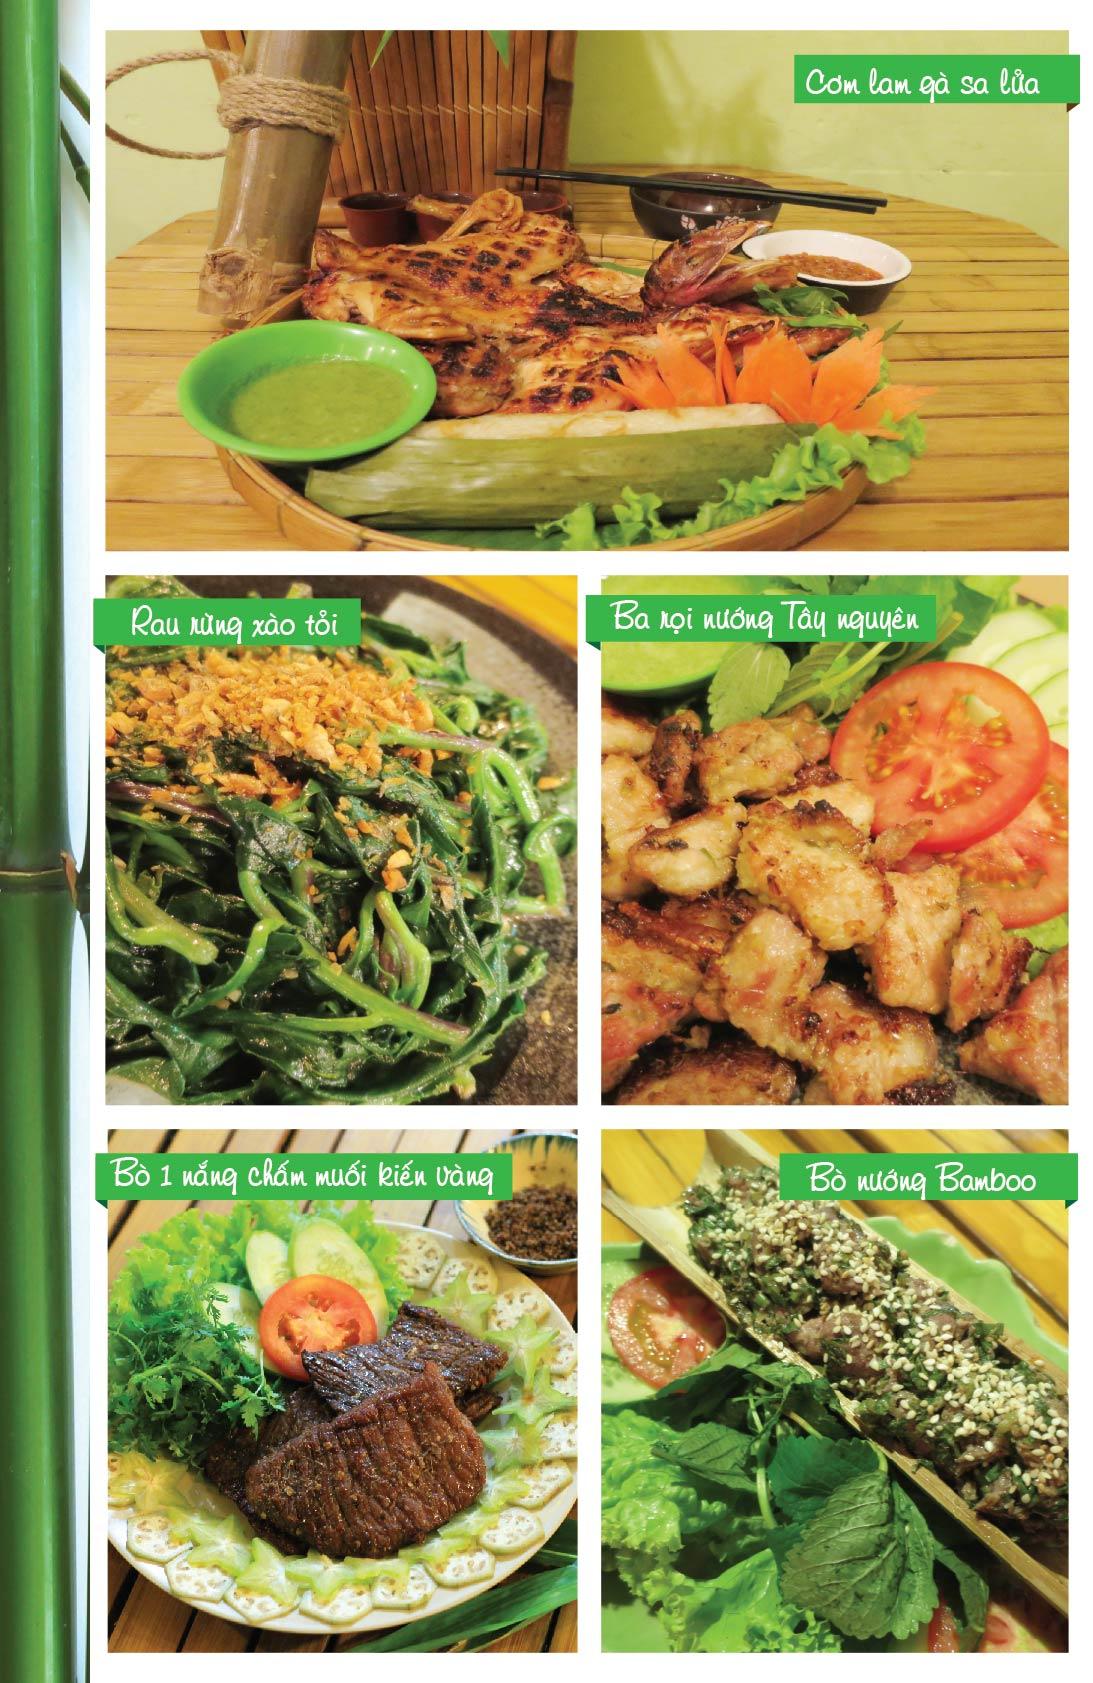 17-10_menu-bamboo-03